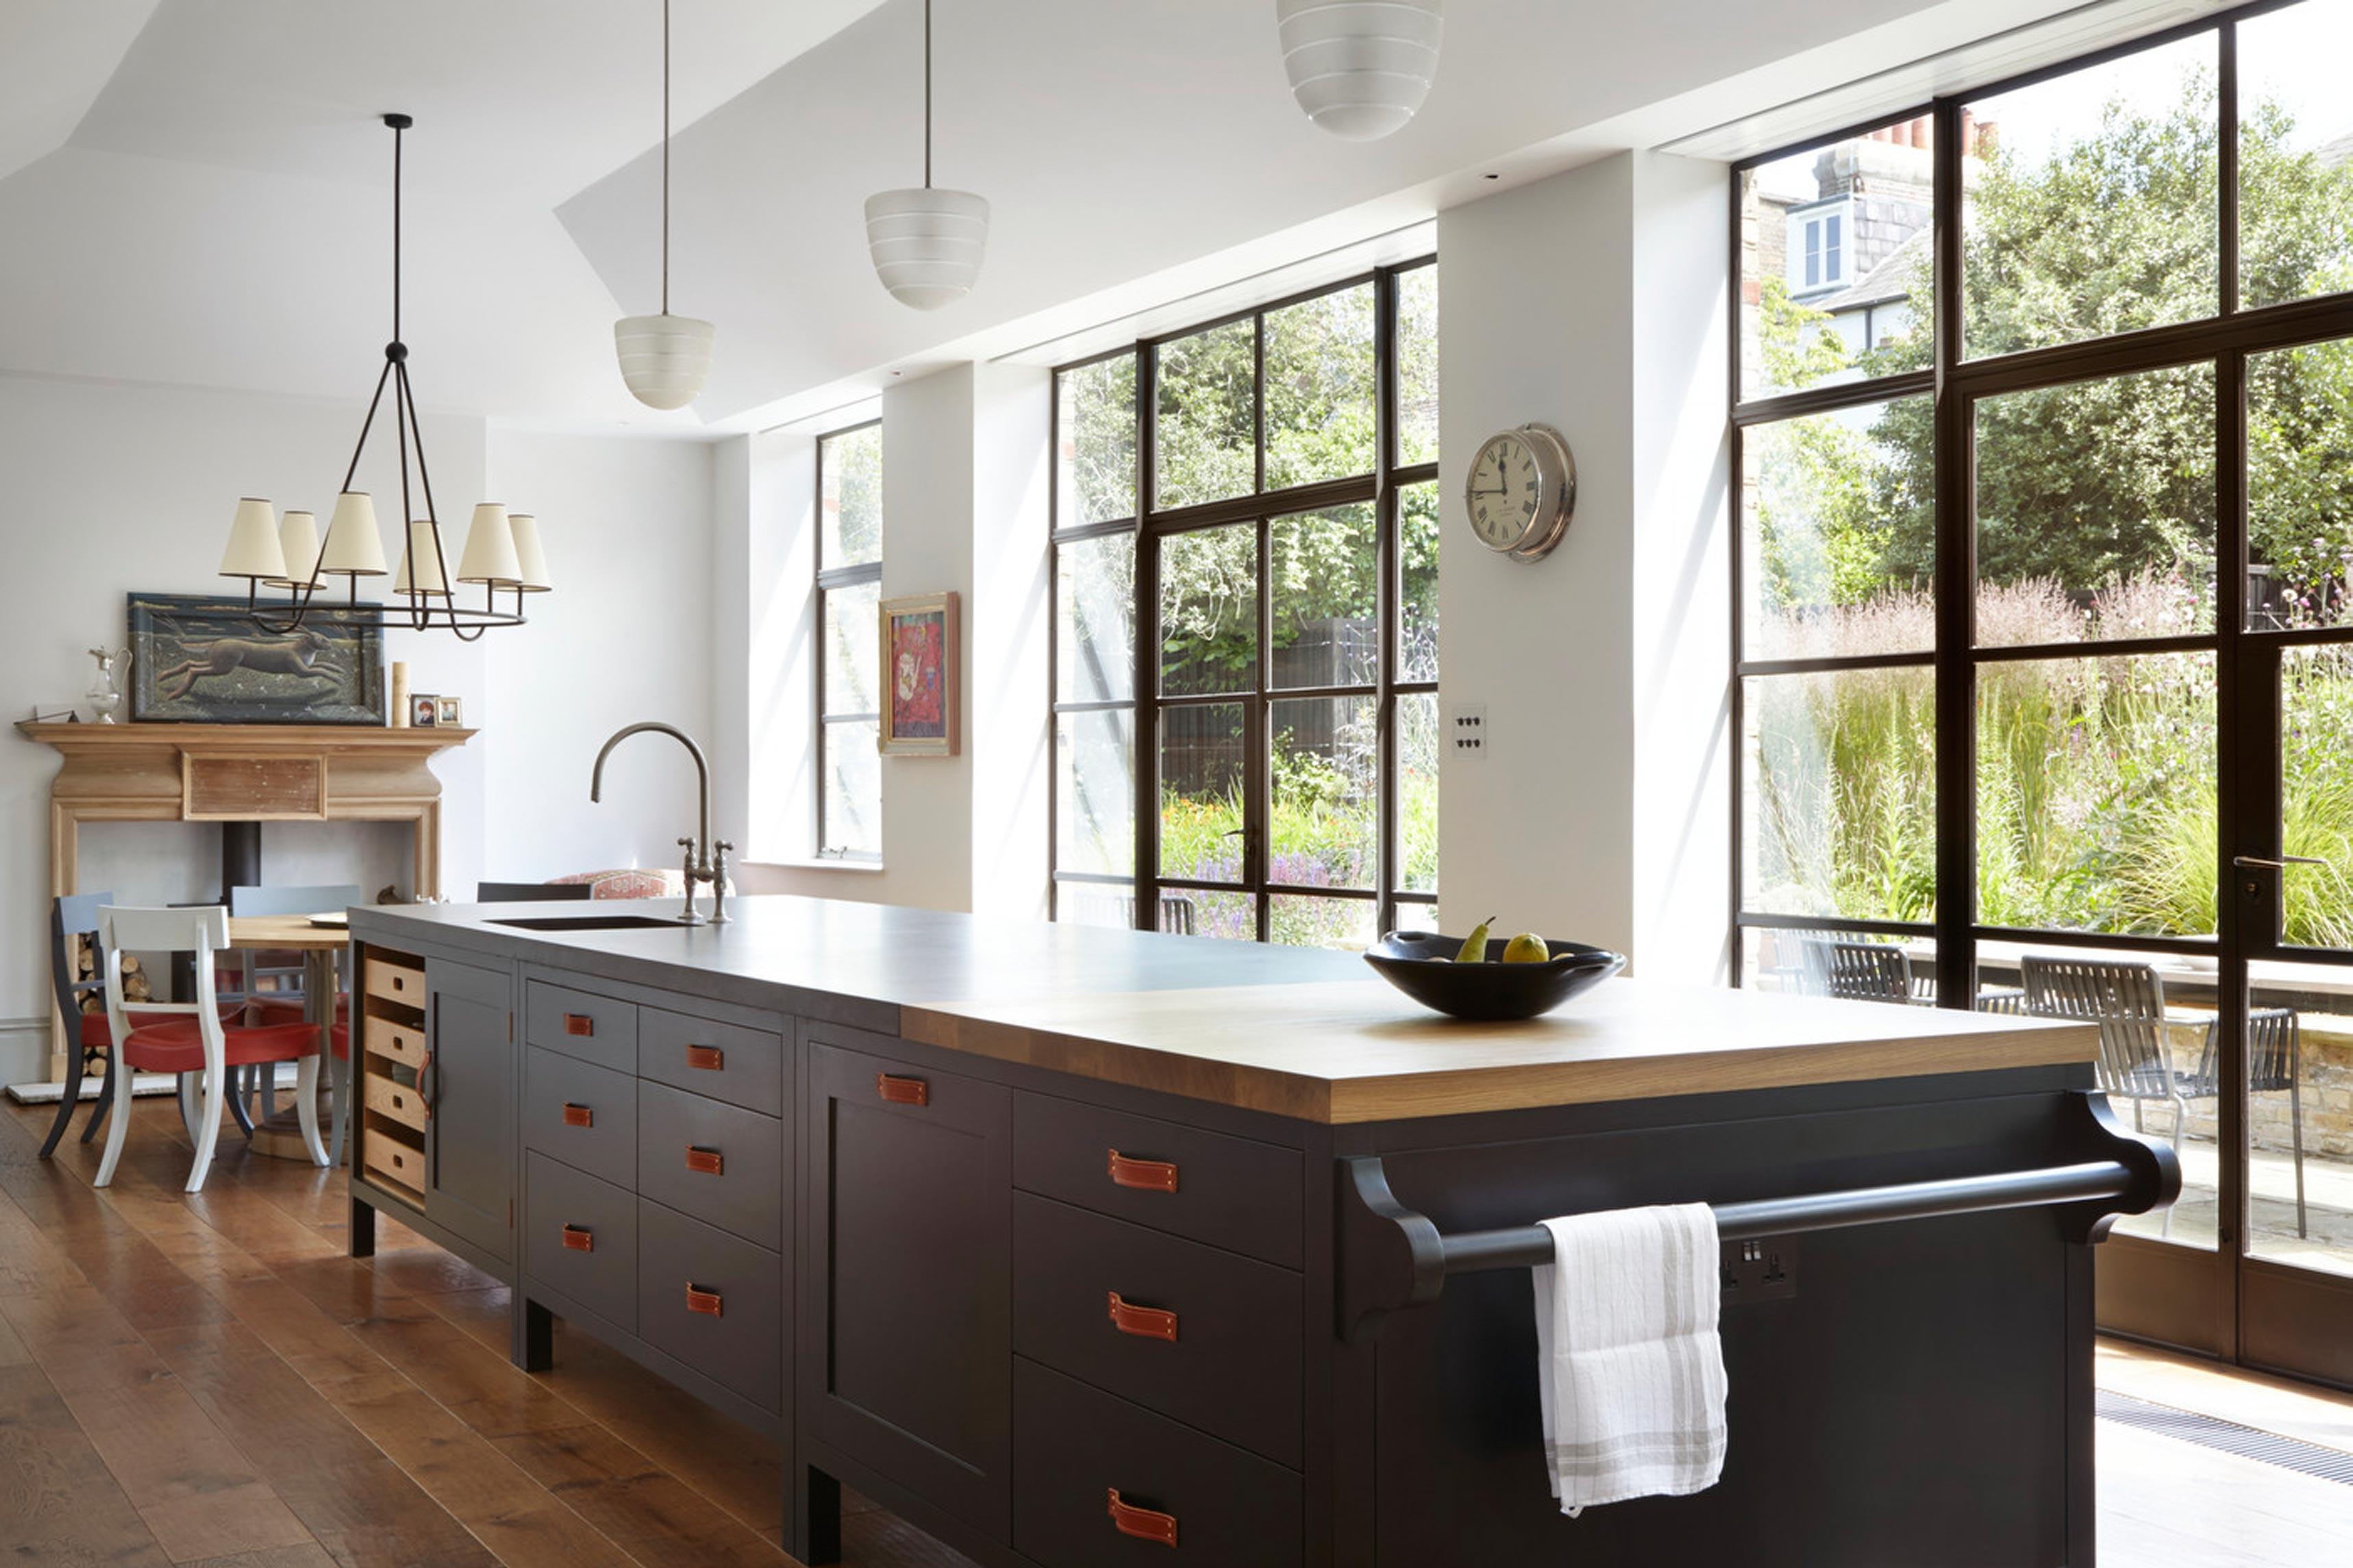 countertops for kitchen cheap sink plain english   victorian villa